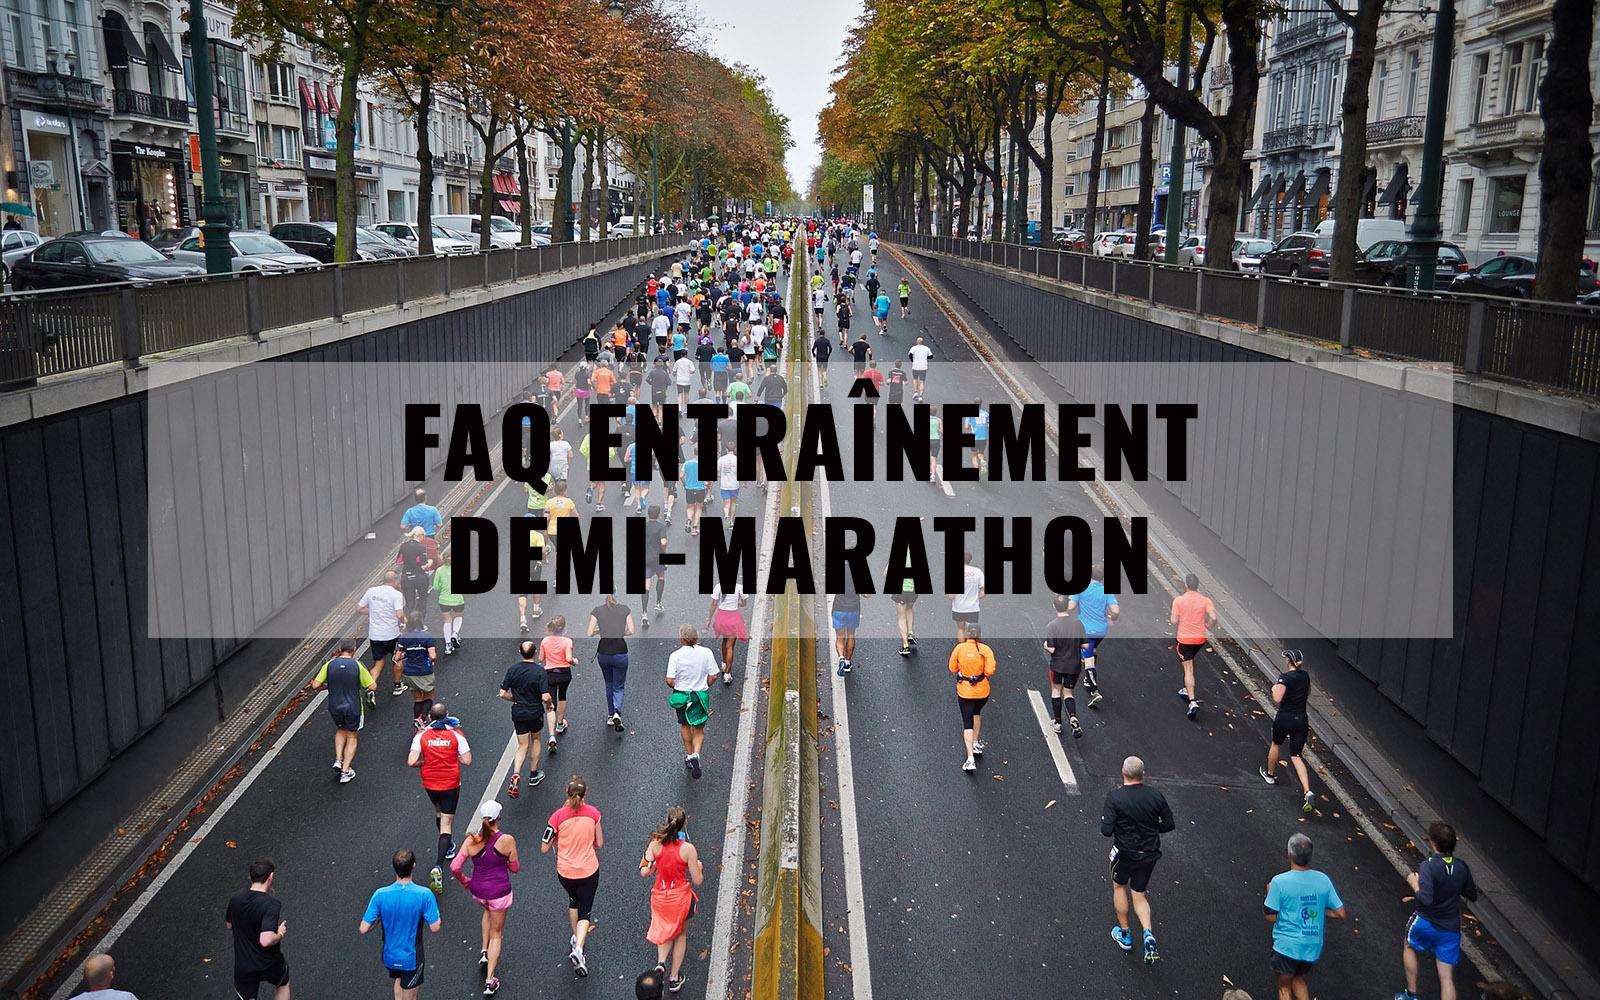 FAQ entraînement demi-marathon